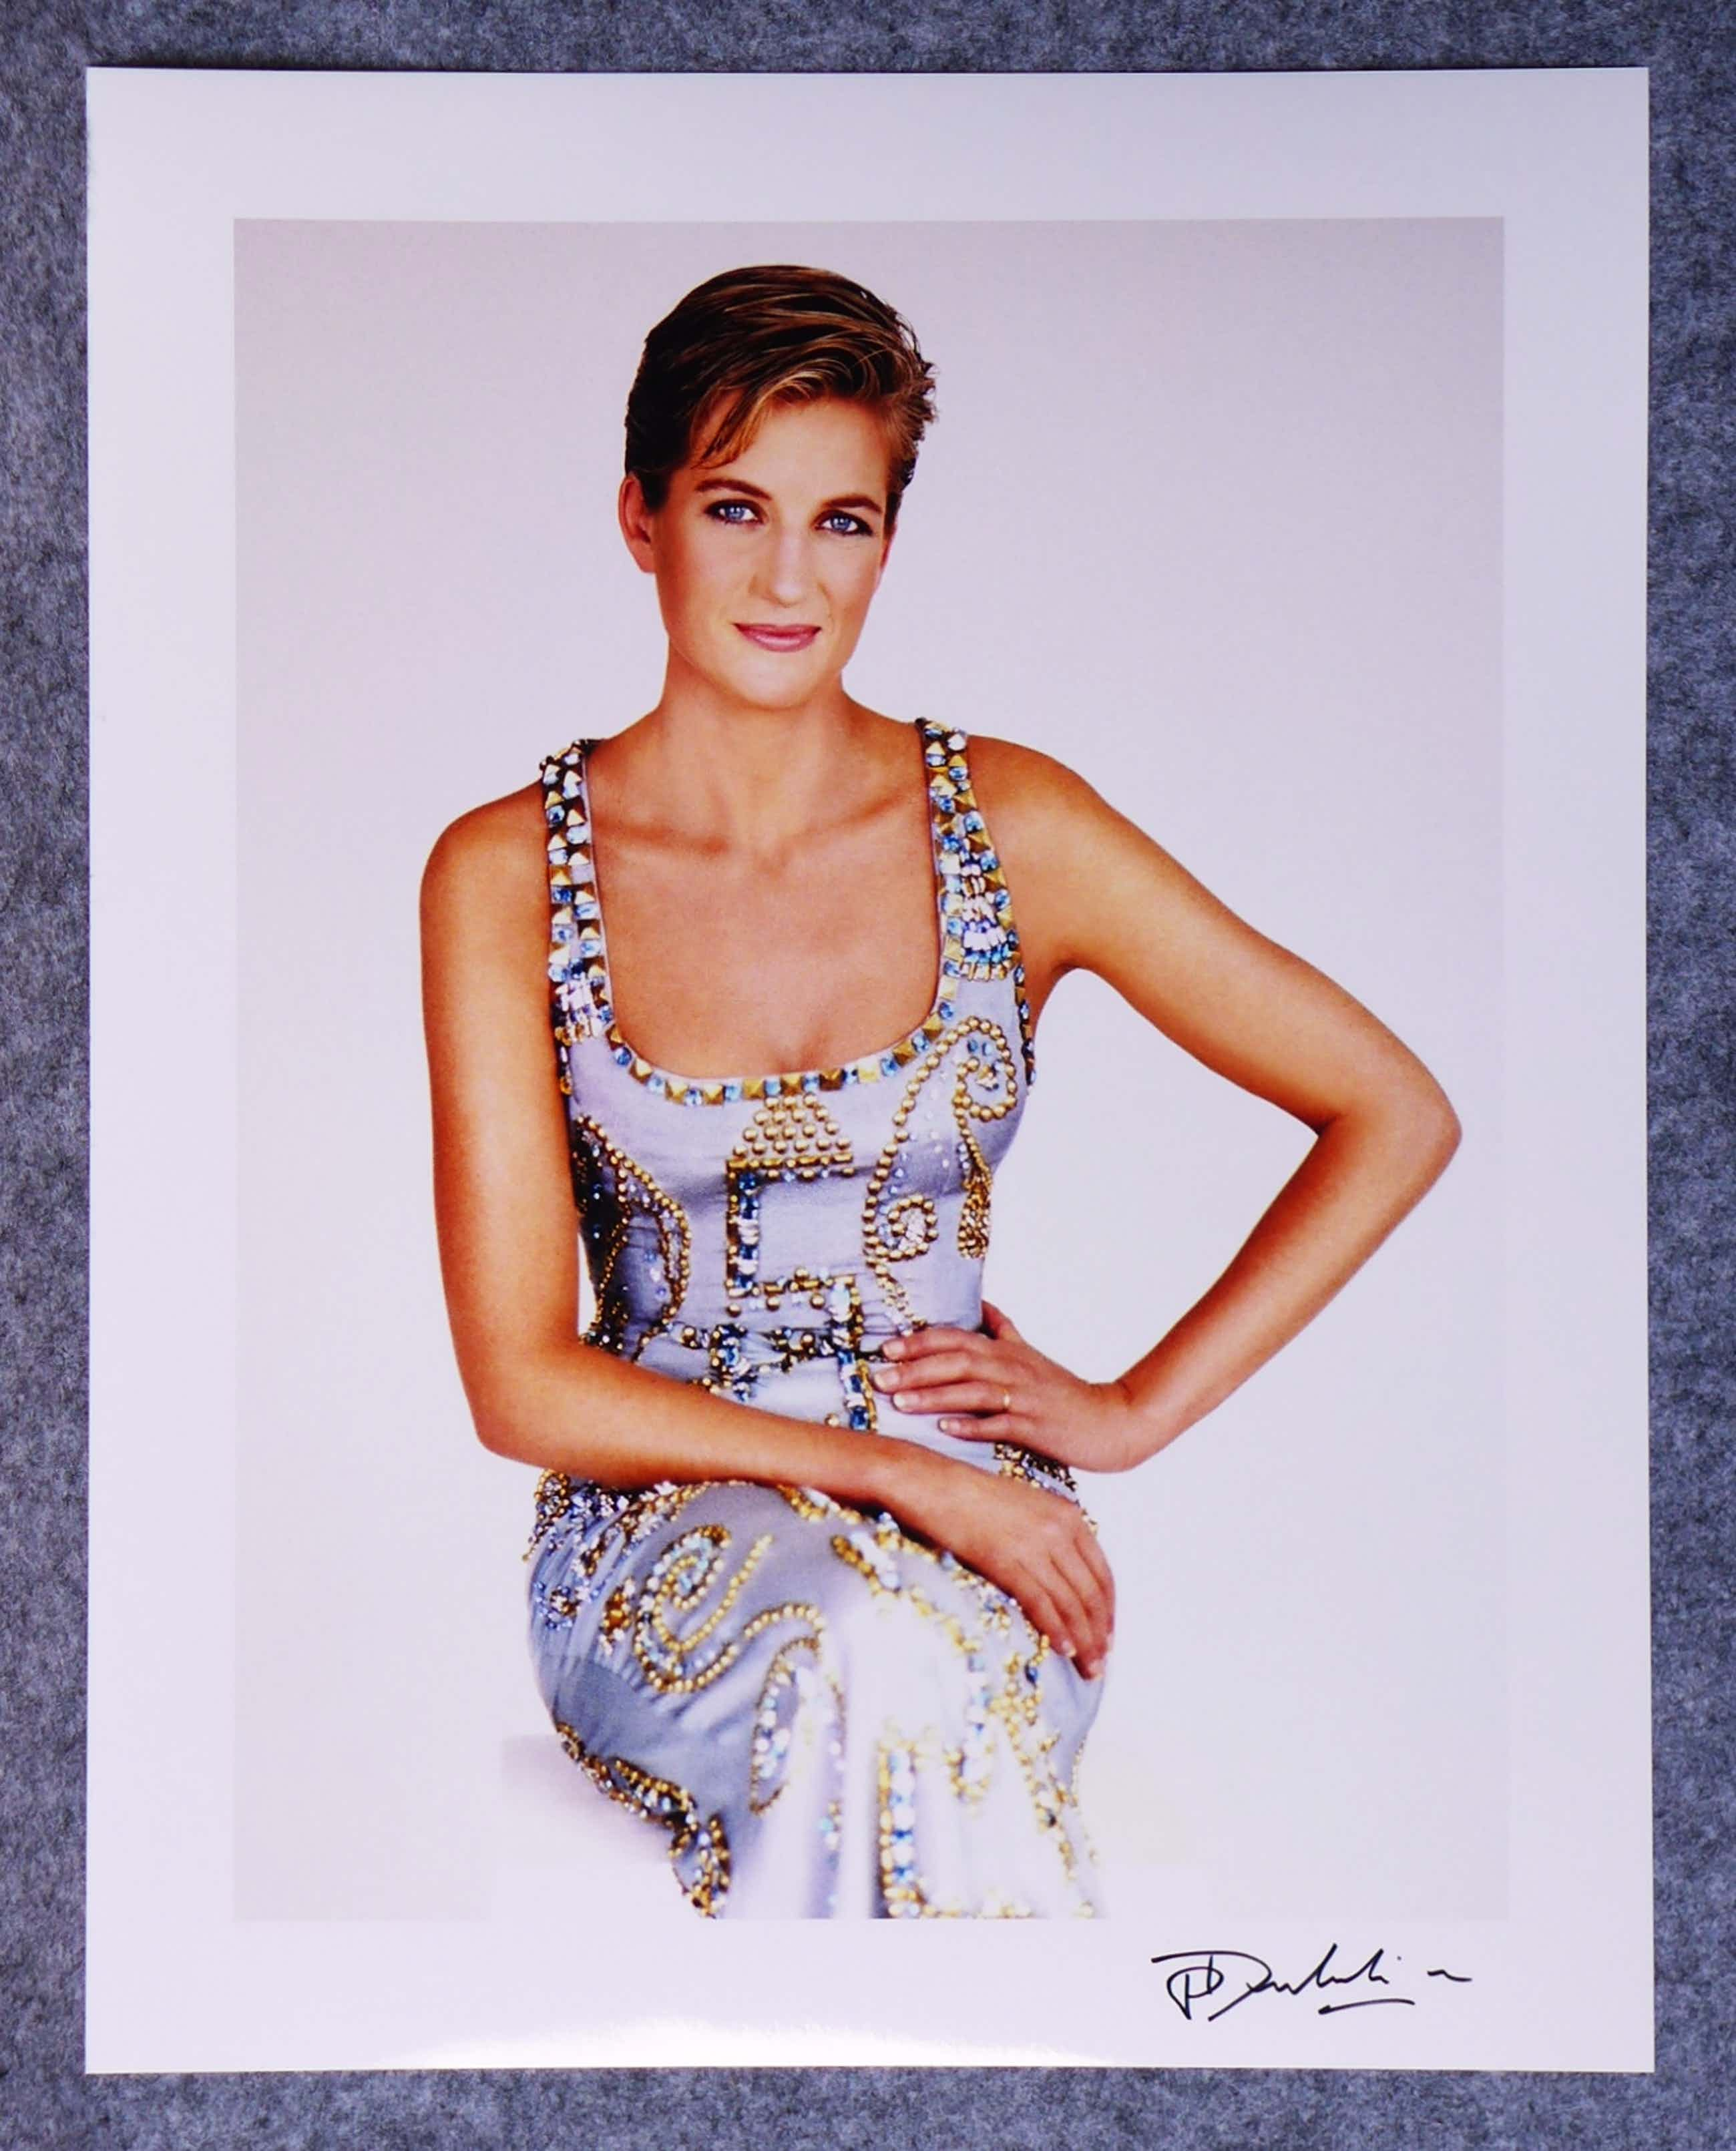 Patrick Demarchelier - Autogramm auf Fotografie HRH Lady Diana Princess of Wales Versace Dress kopen? Bied vanaf 49!